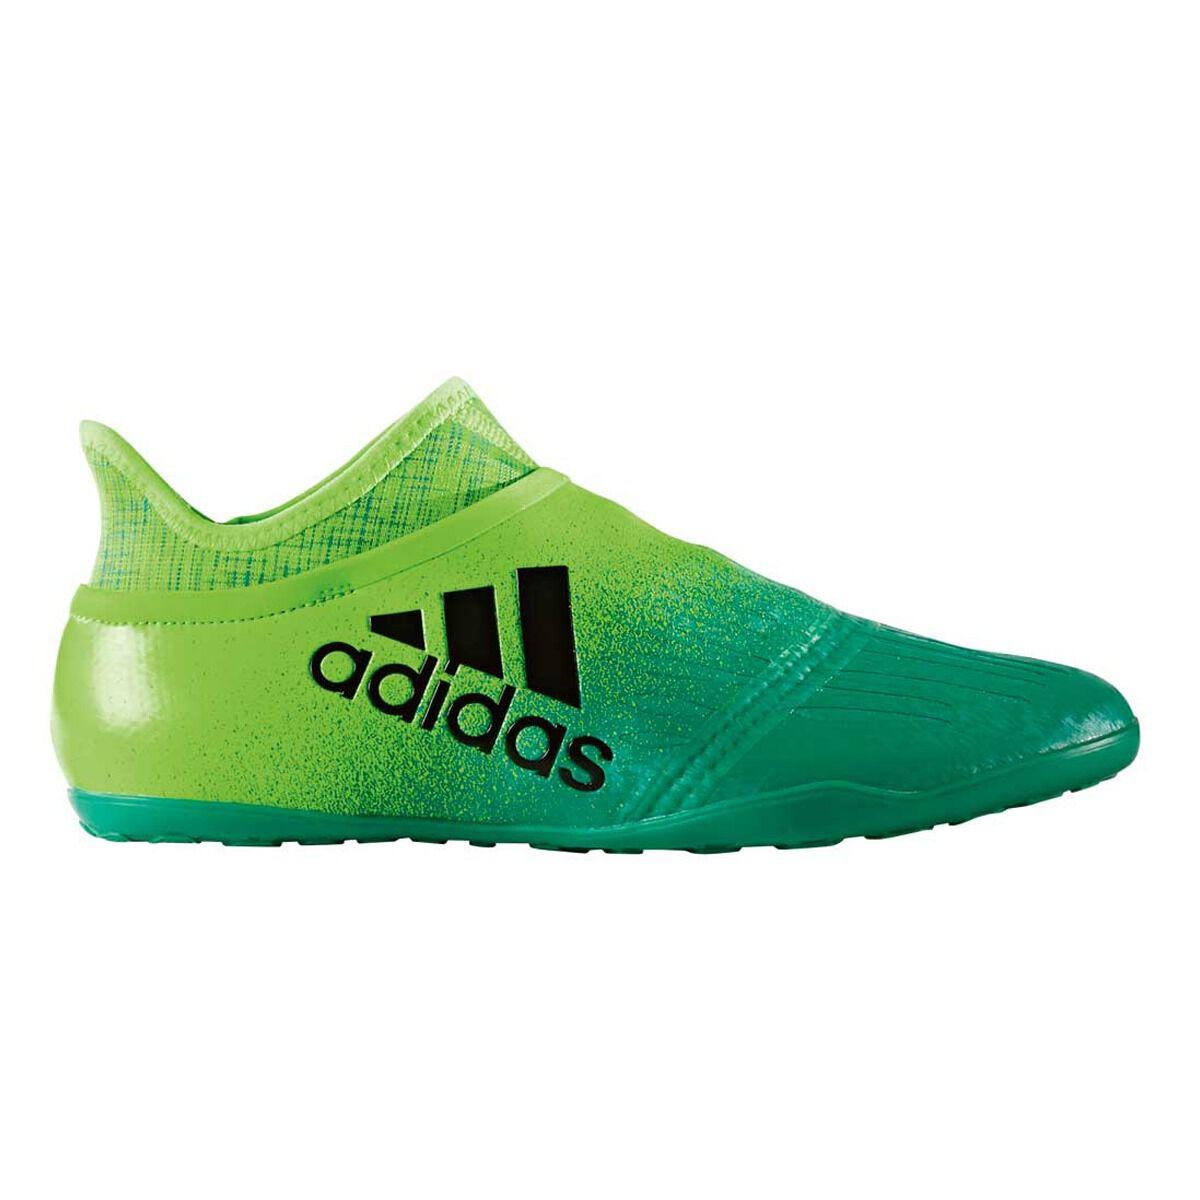 adidas X Tango 16 Purespeed Indoor Soccer Shoes Green / Black US 10 Adult,